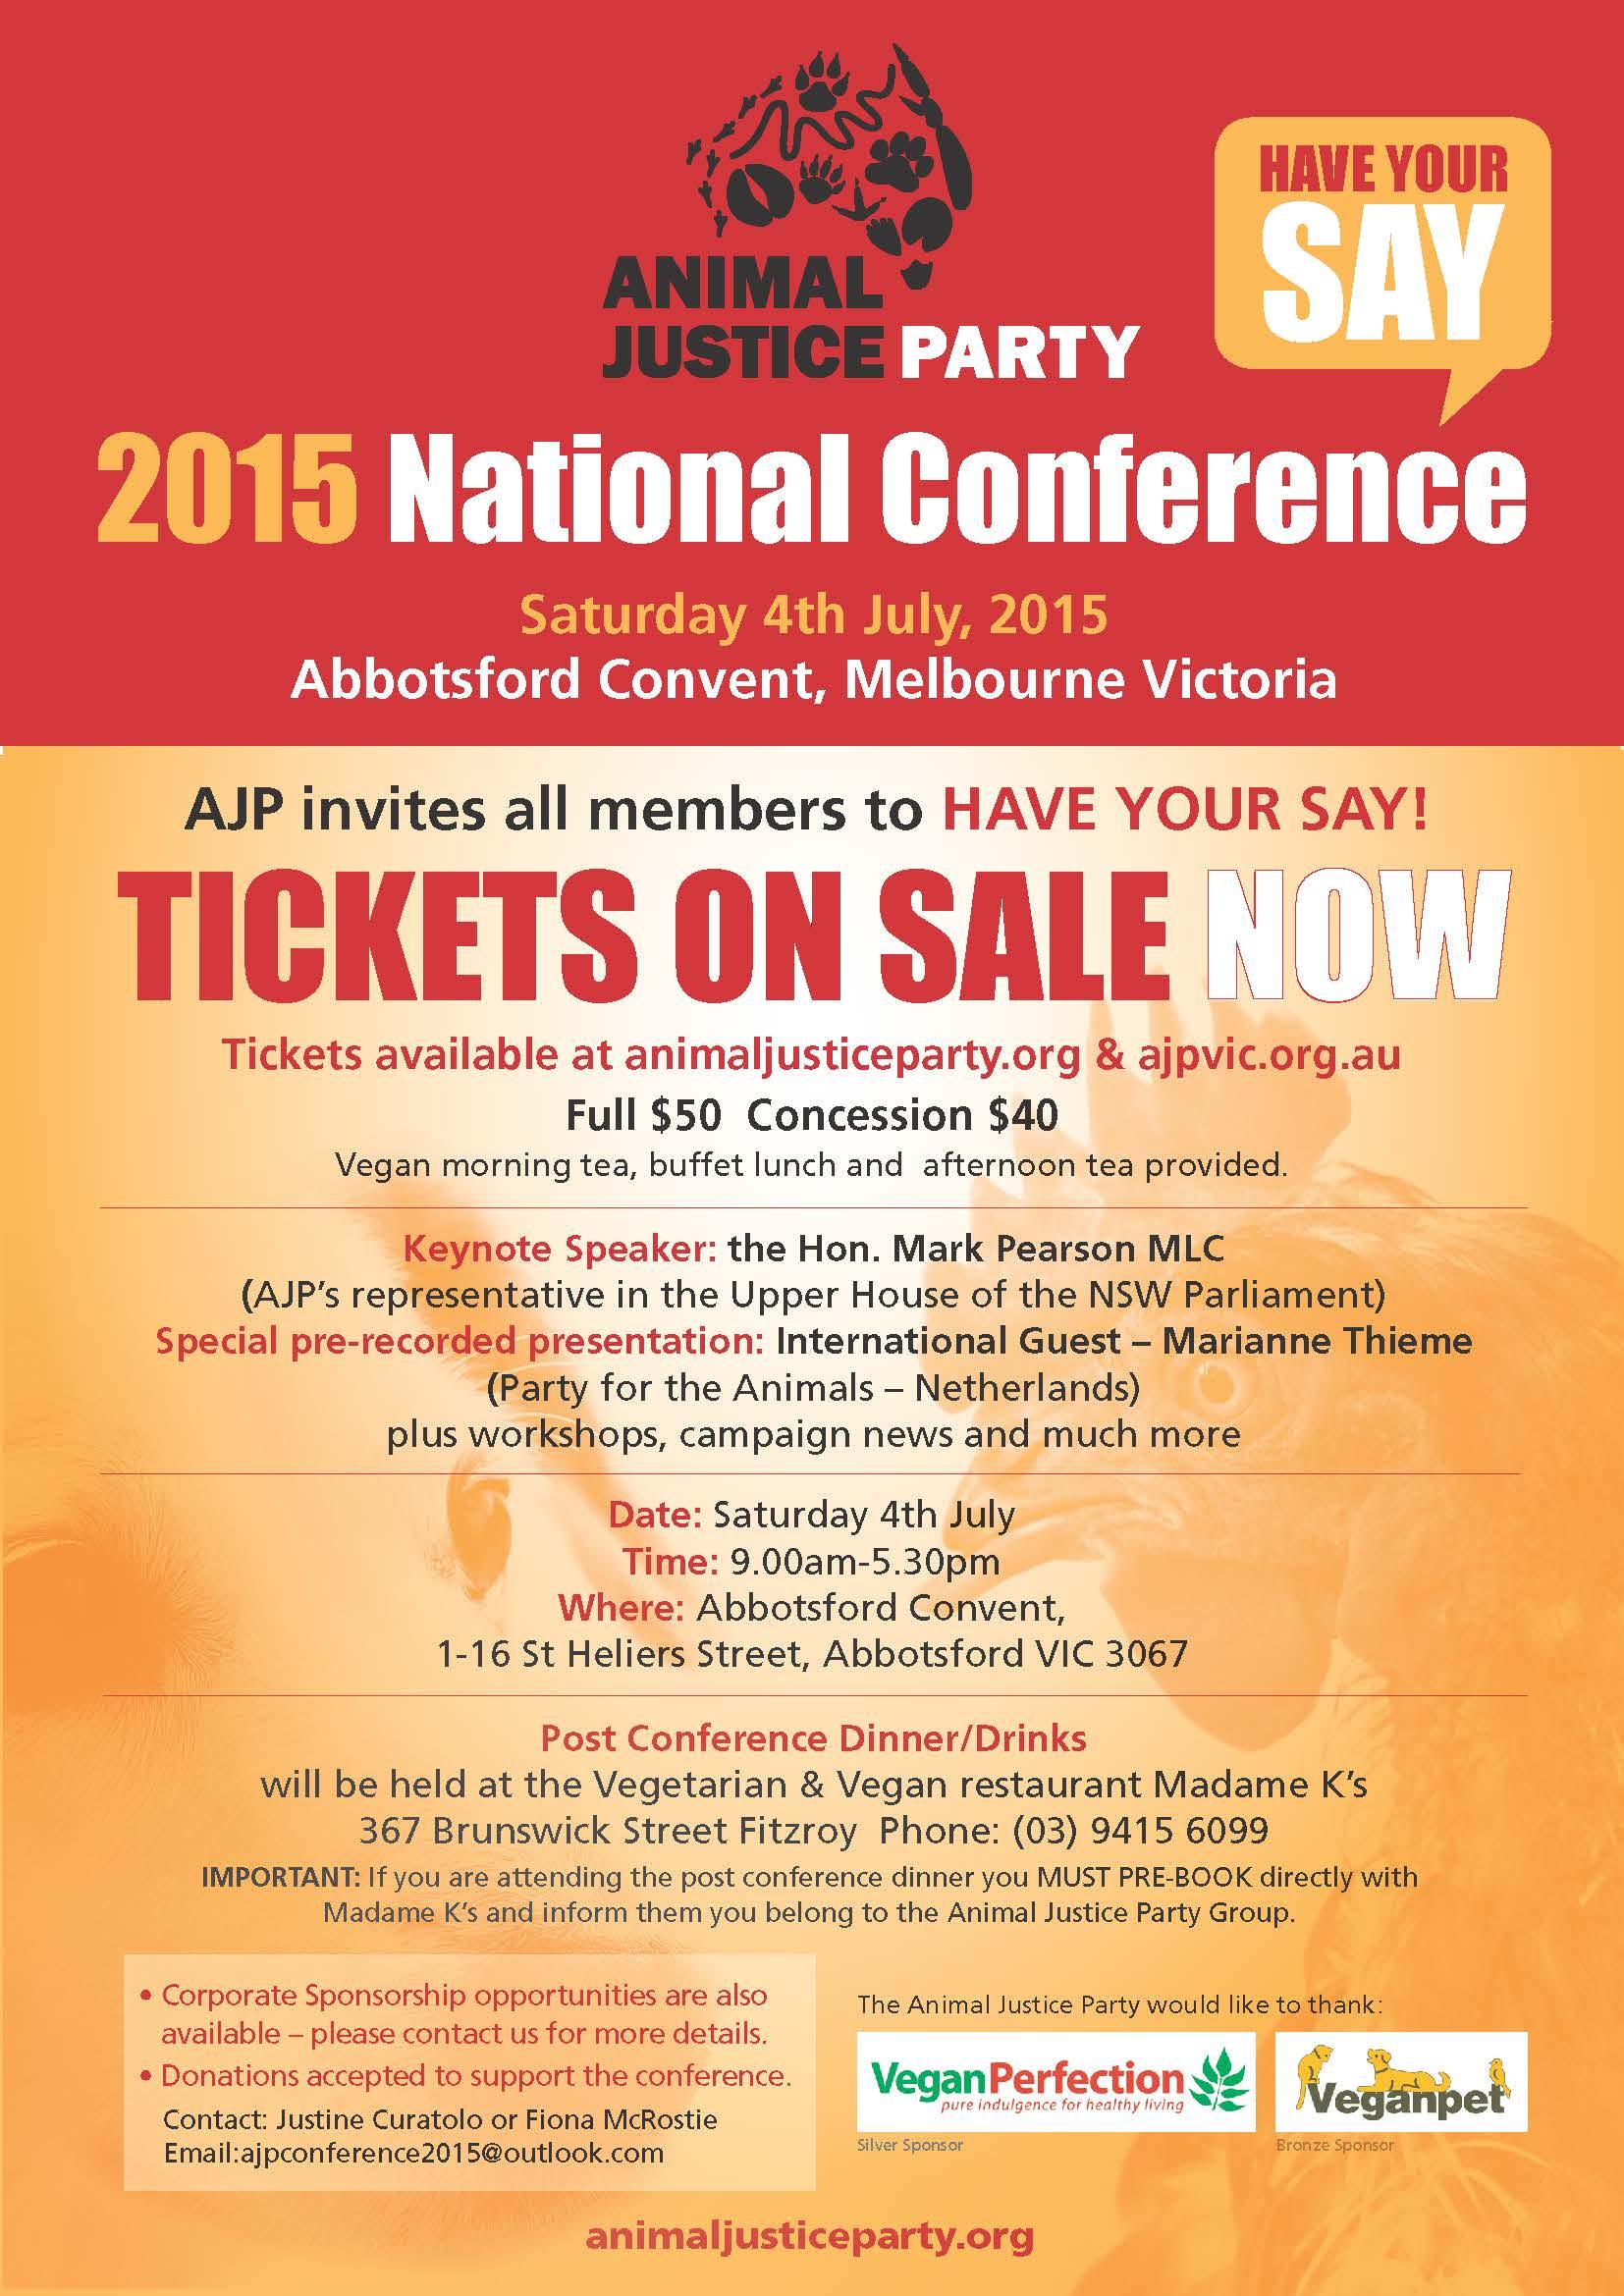 AJP_conference_flyer.jpg